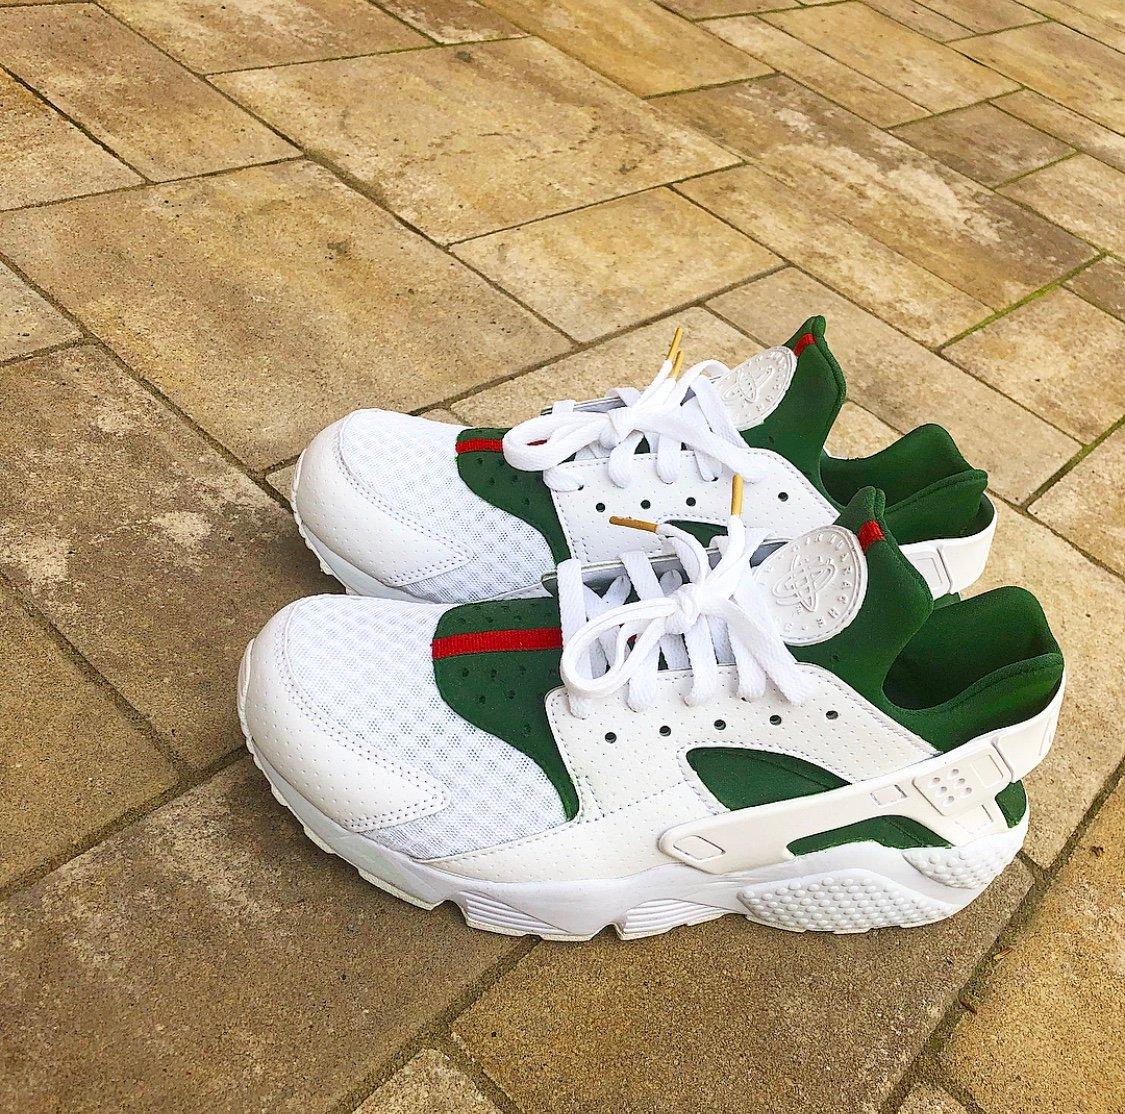 Image of Men's Nike Huarache White 'Gucci' Custom